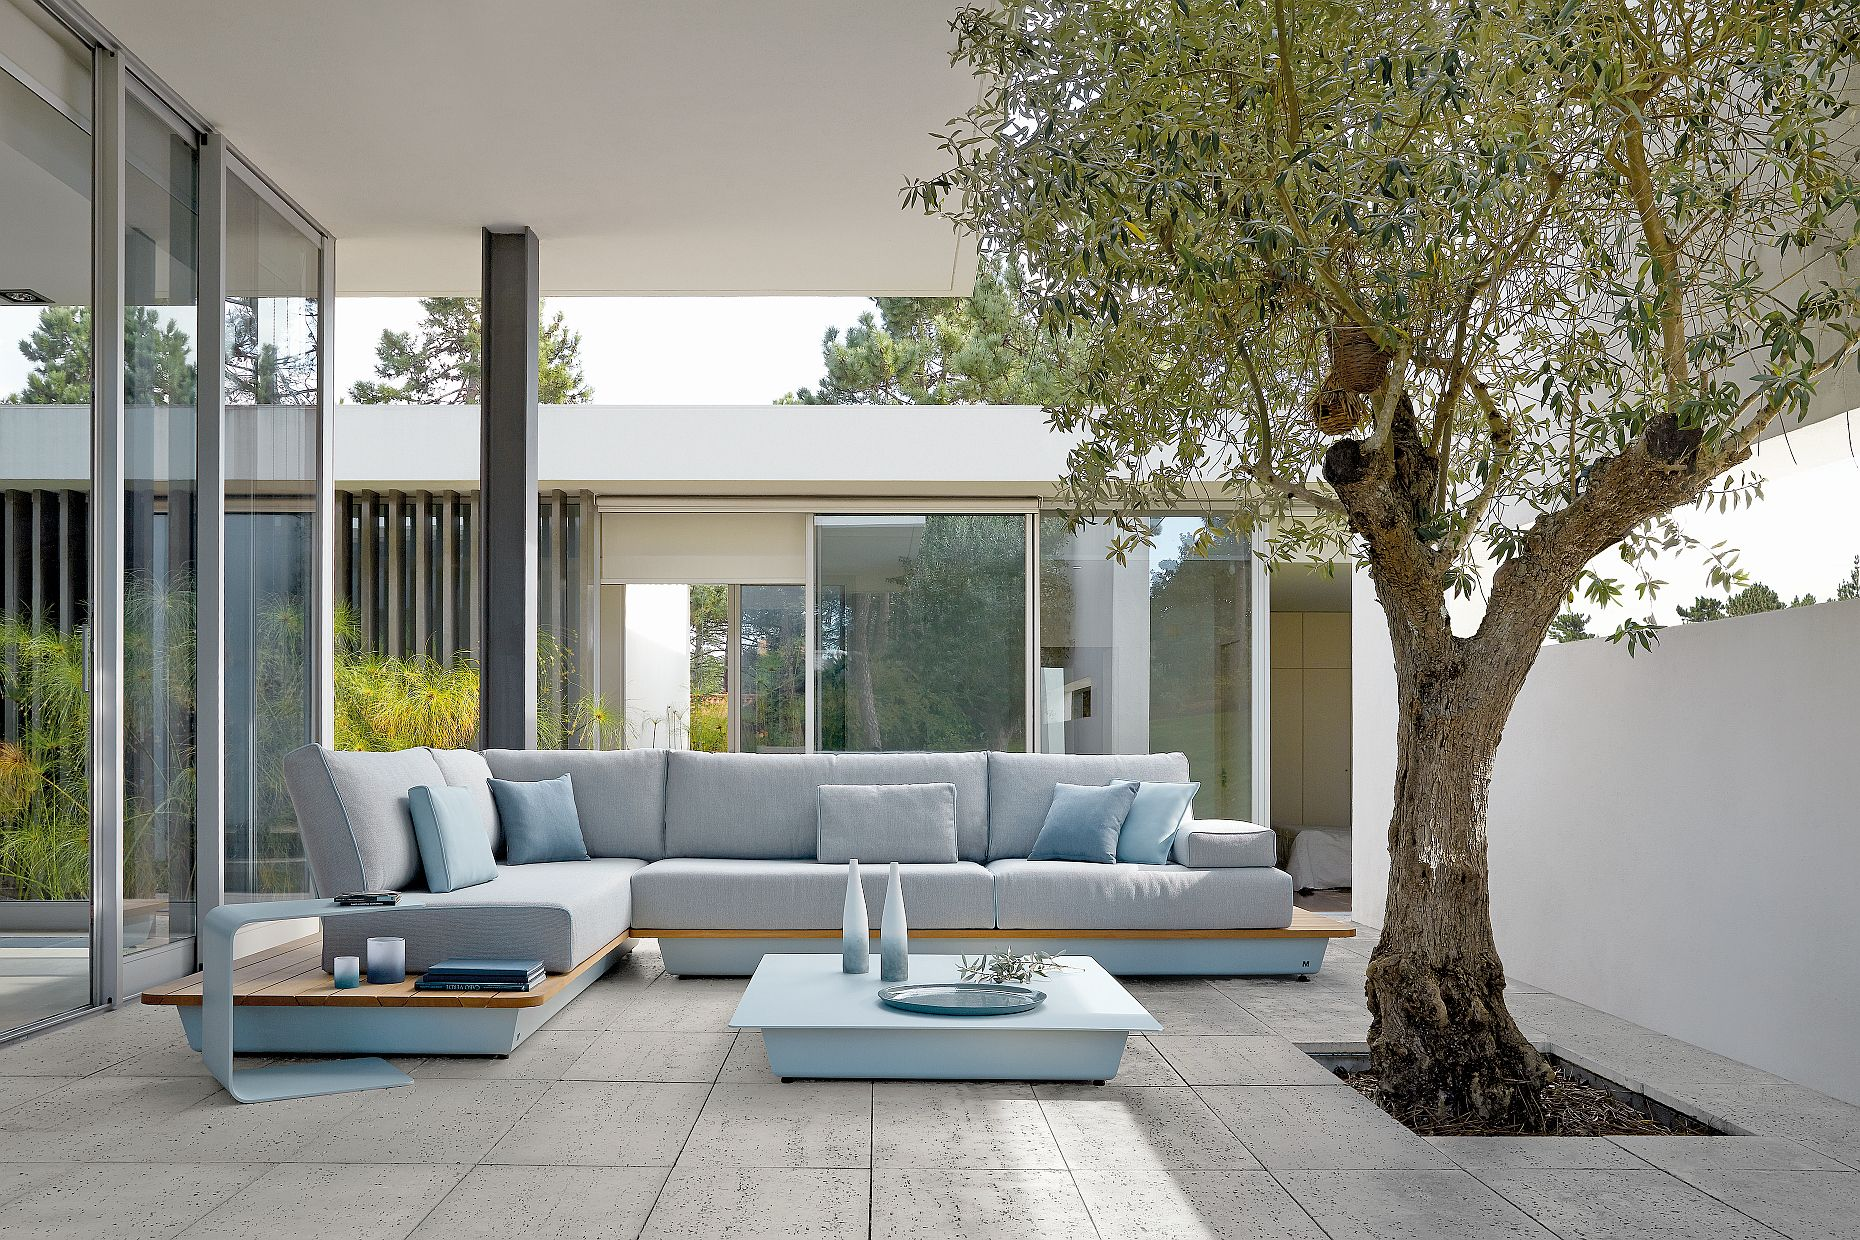 manutti 2015 the new air collection stunning modular all weather designs garden furnituregarden - Garden Furniture 2015 Uk